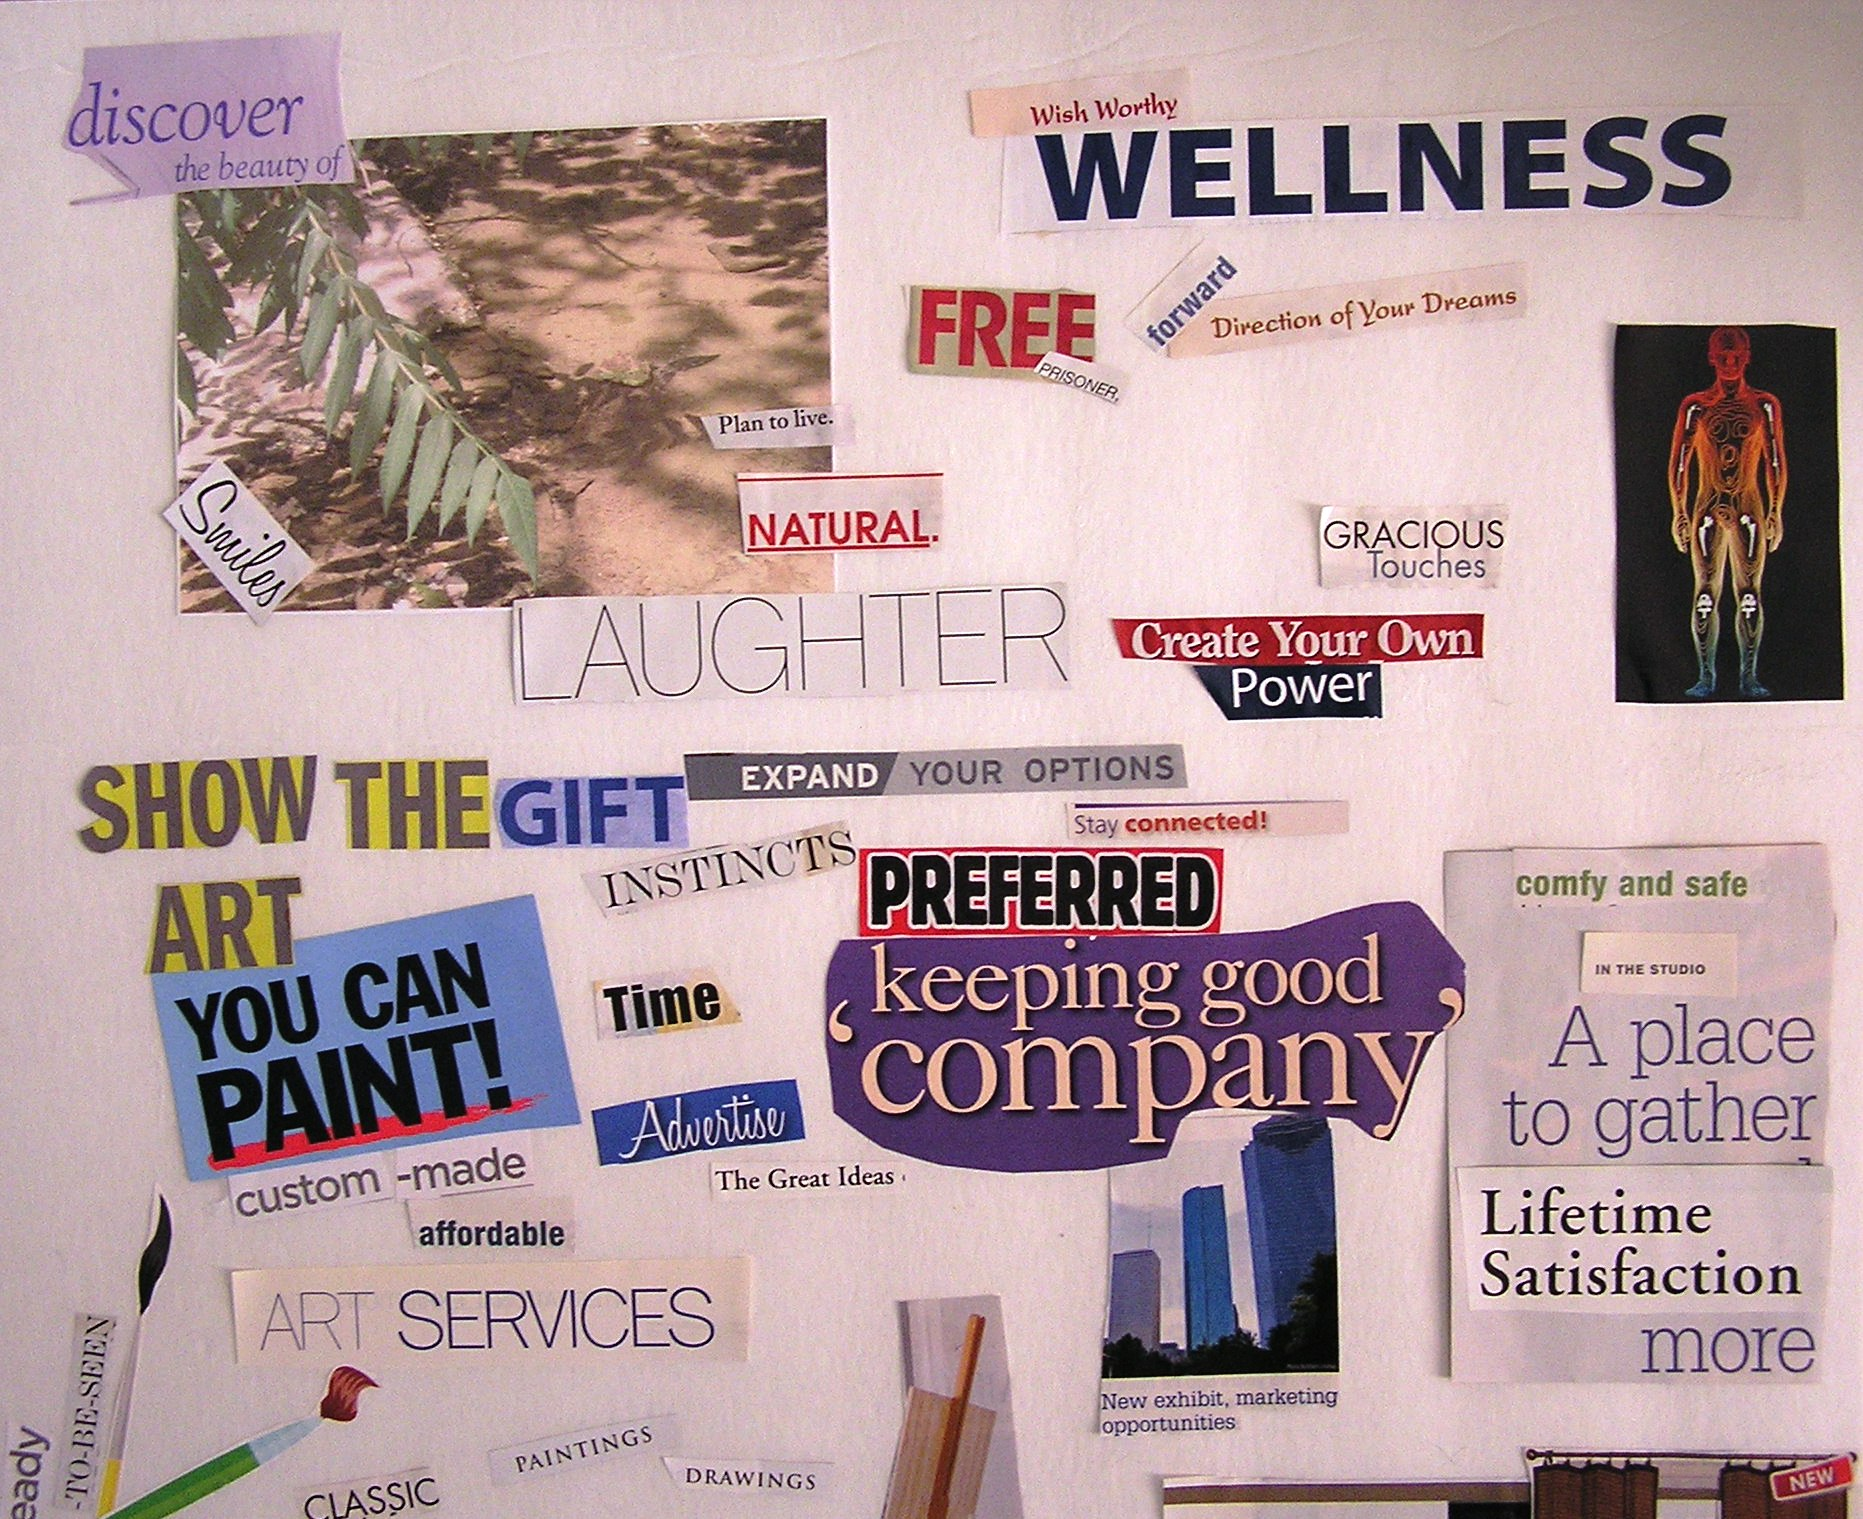 Activities For Healing With Art